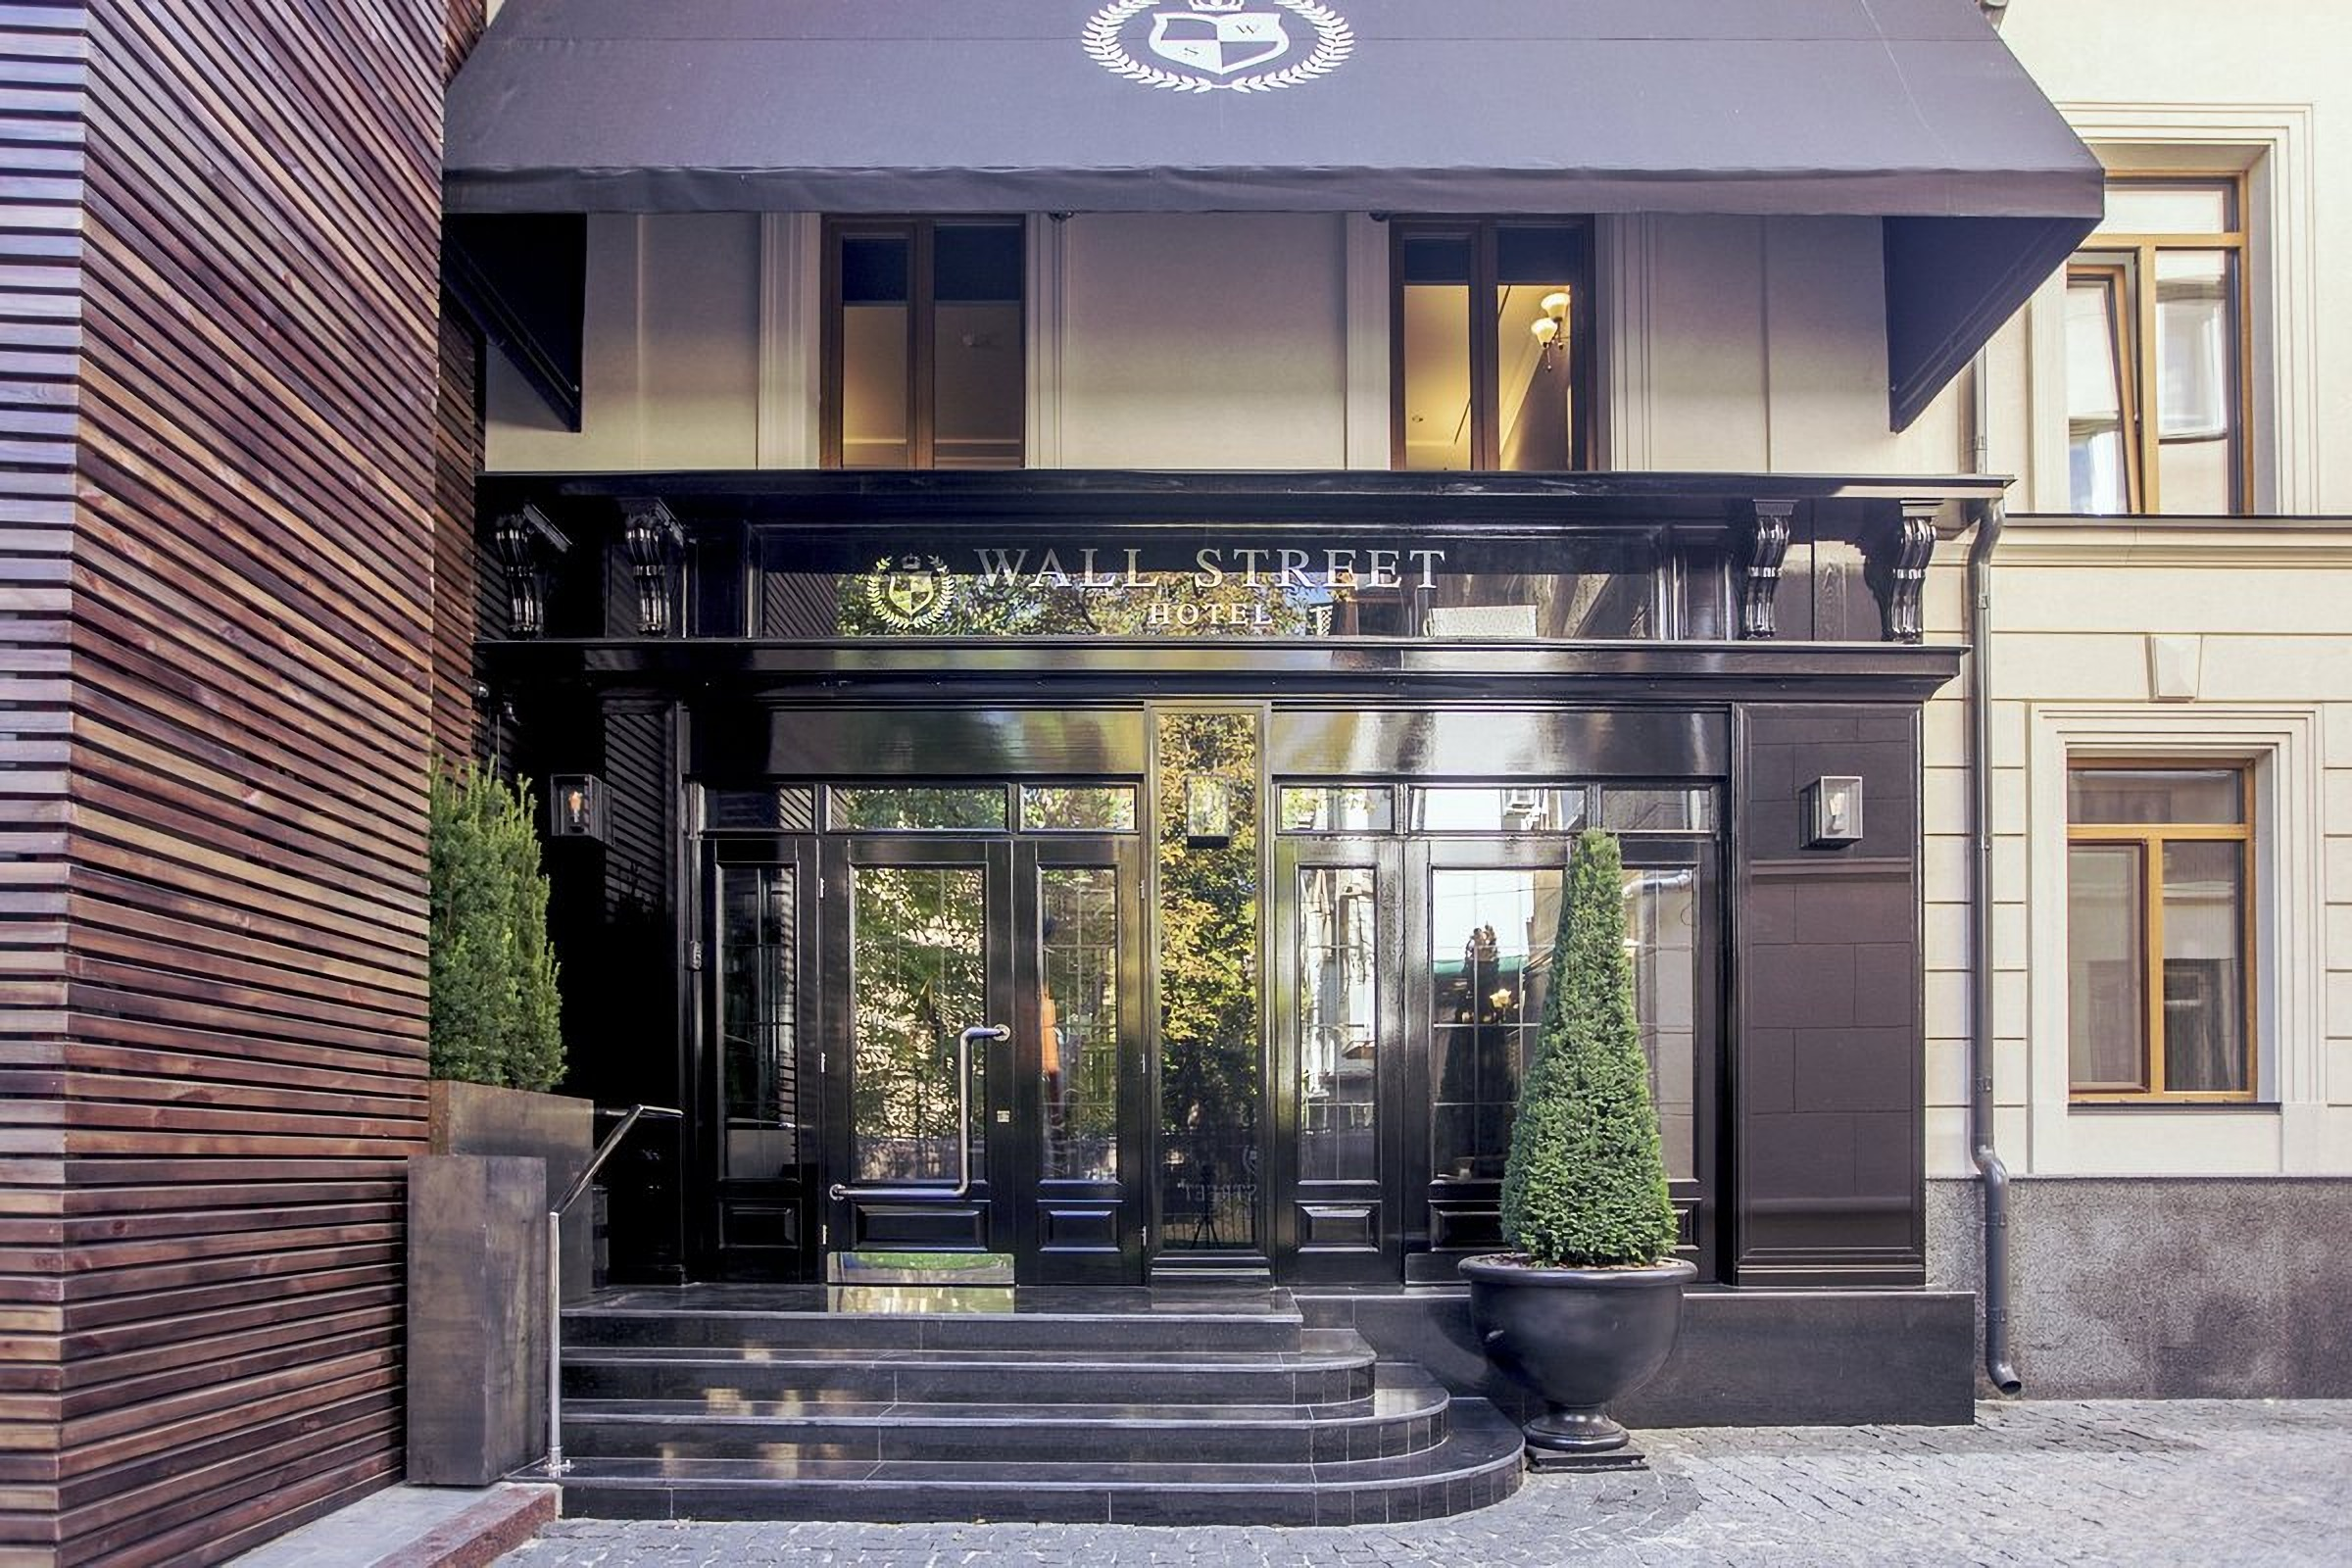 Entrance to the Wall Street Hotel Odessa Ukraine